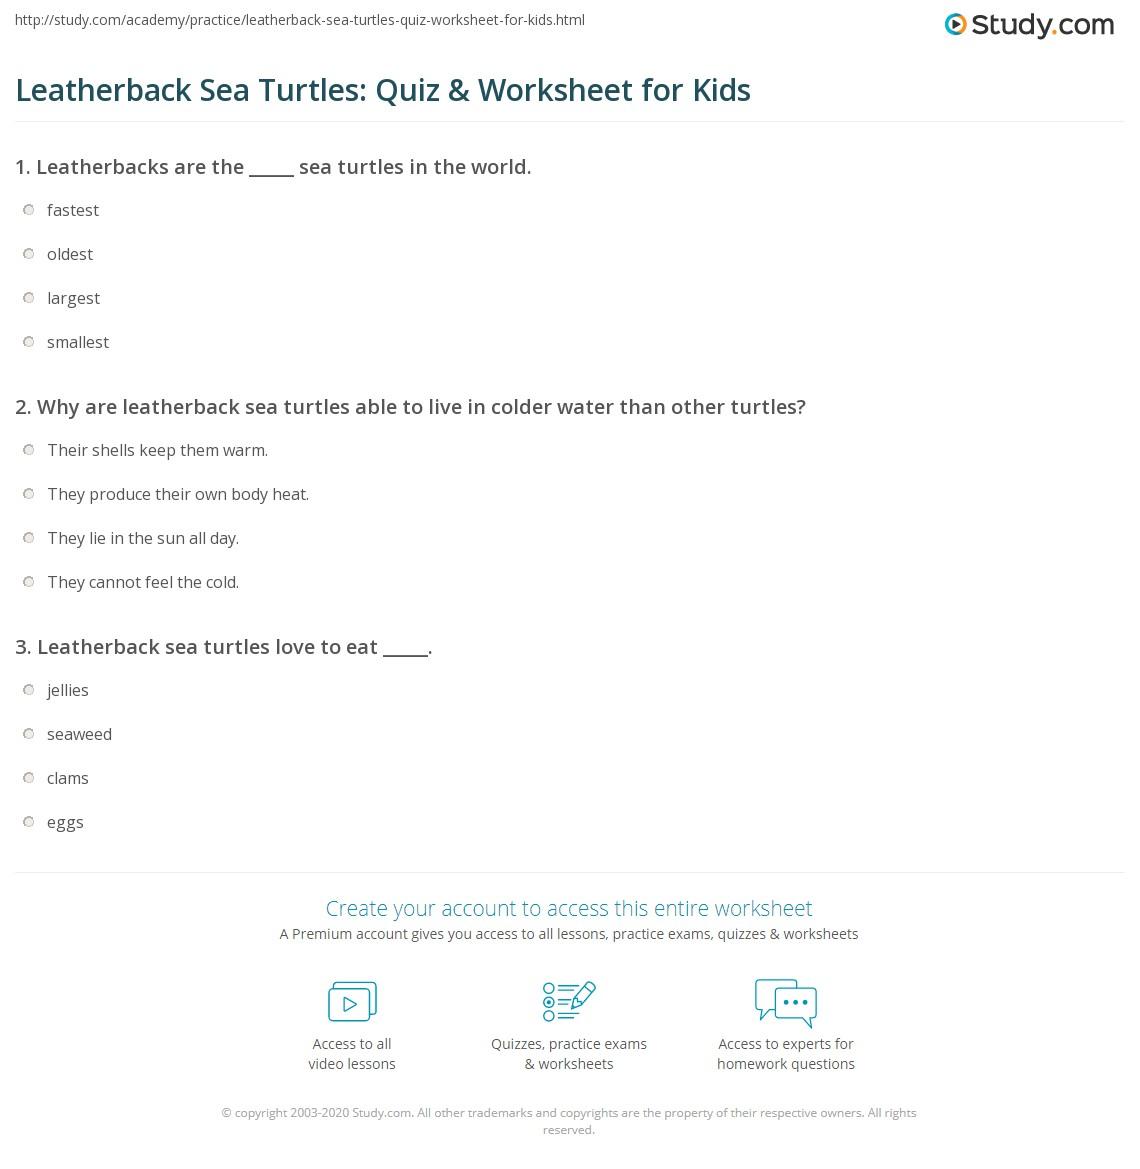 Leatherback Sea Turtles Quiz Amp Worksheet For Kids